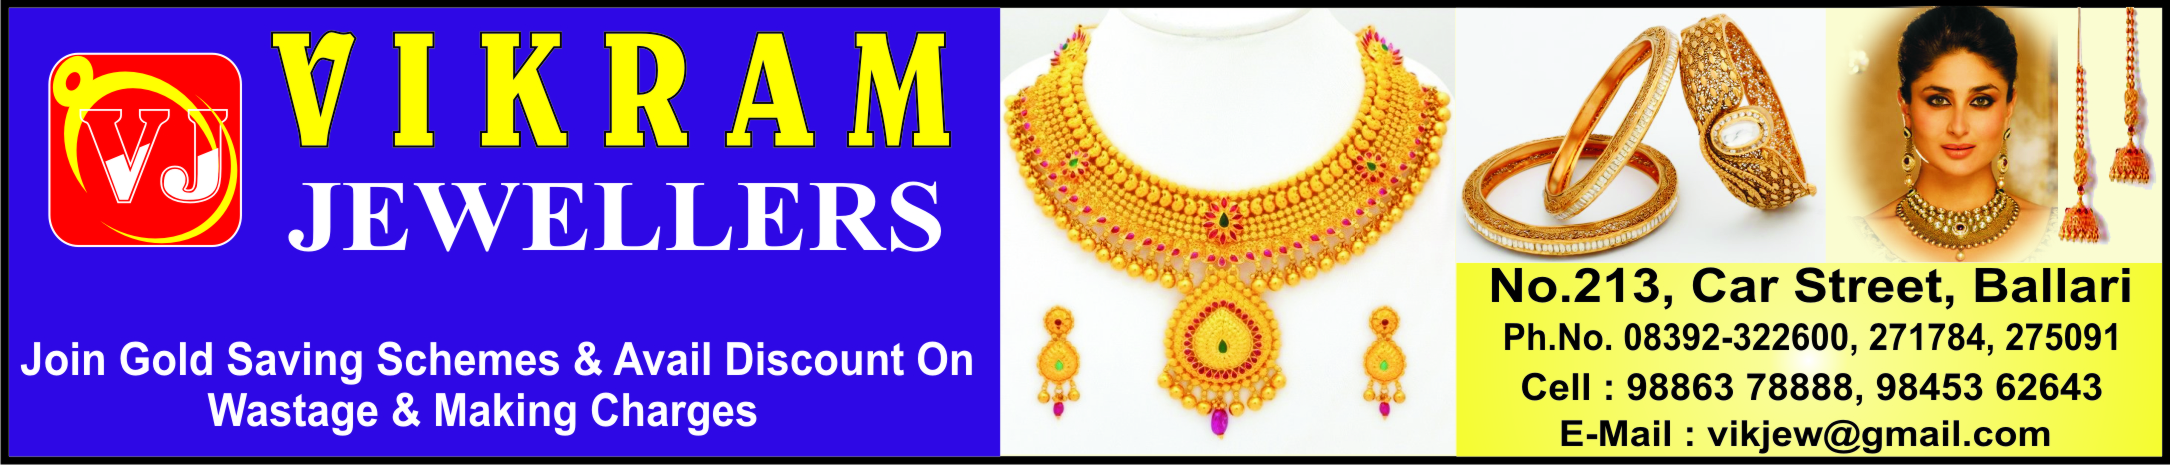 Vikram Jewellers